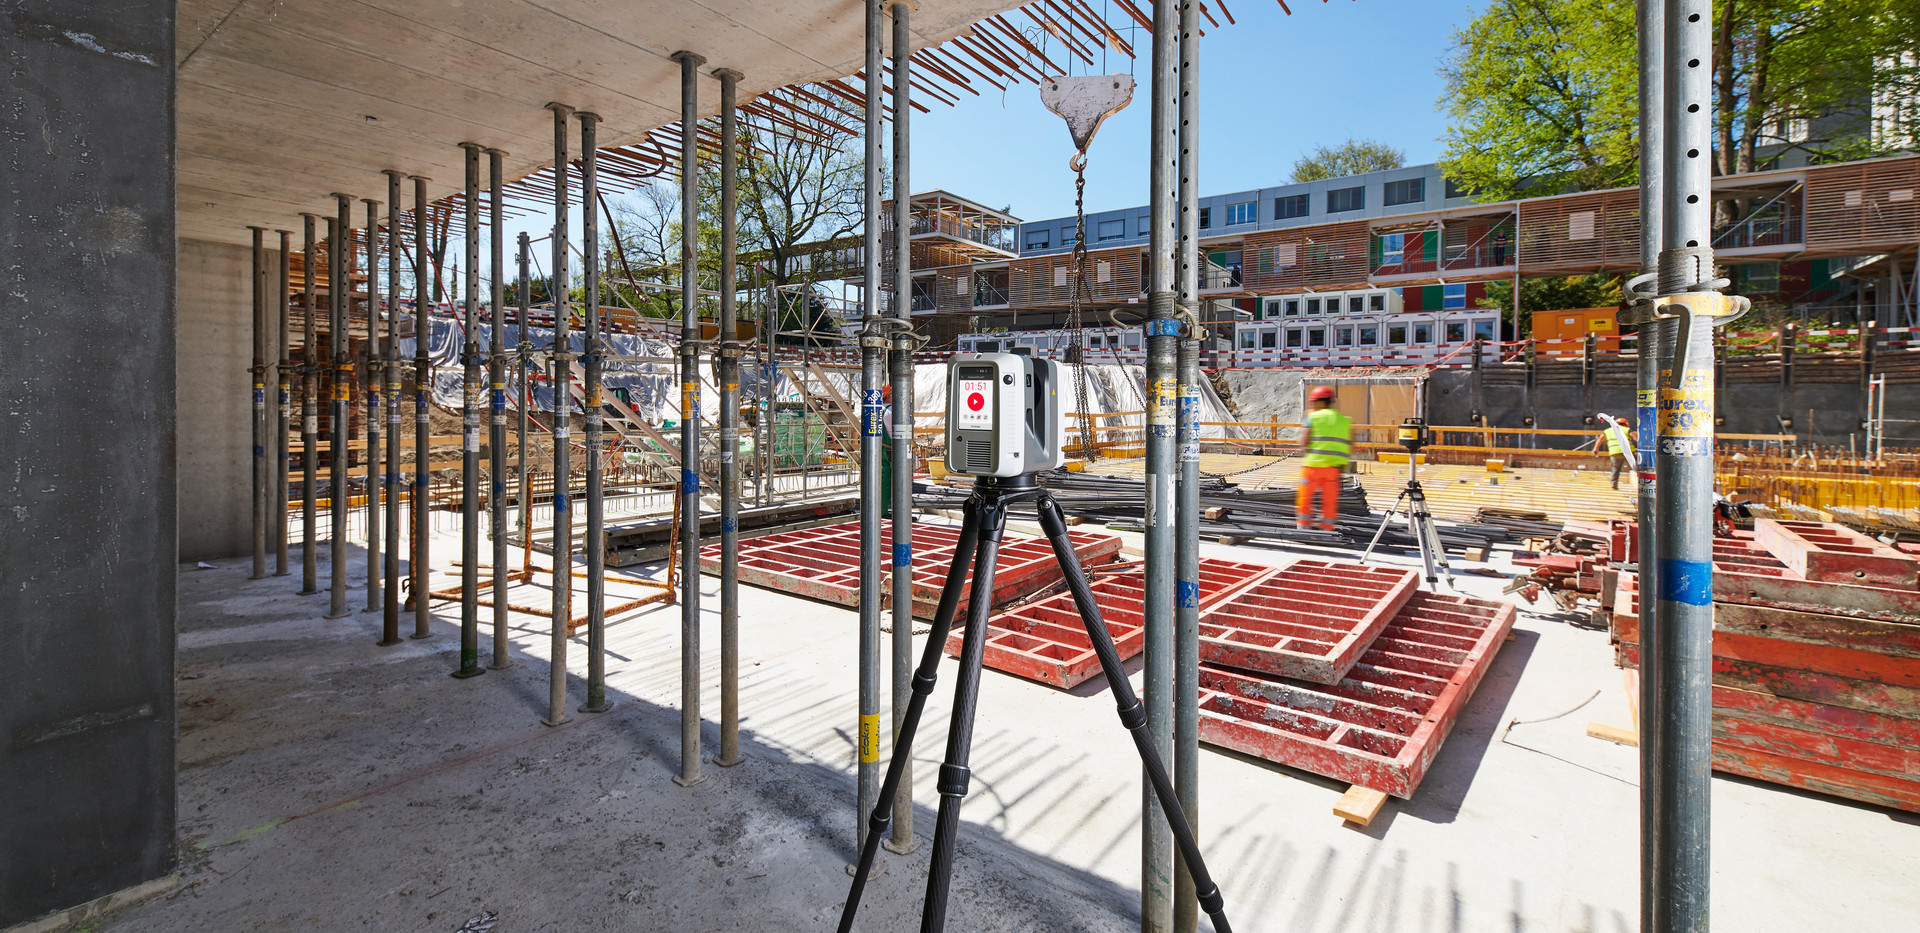 Leica RTC360 Building Construction 300dp